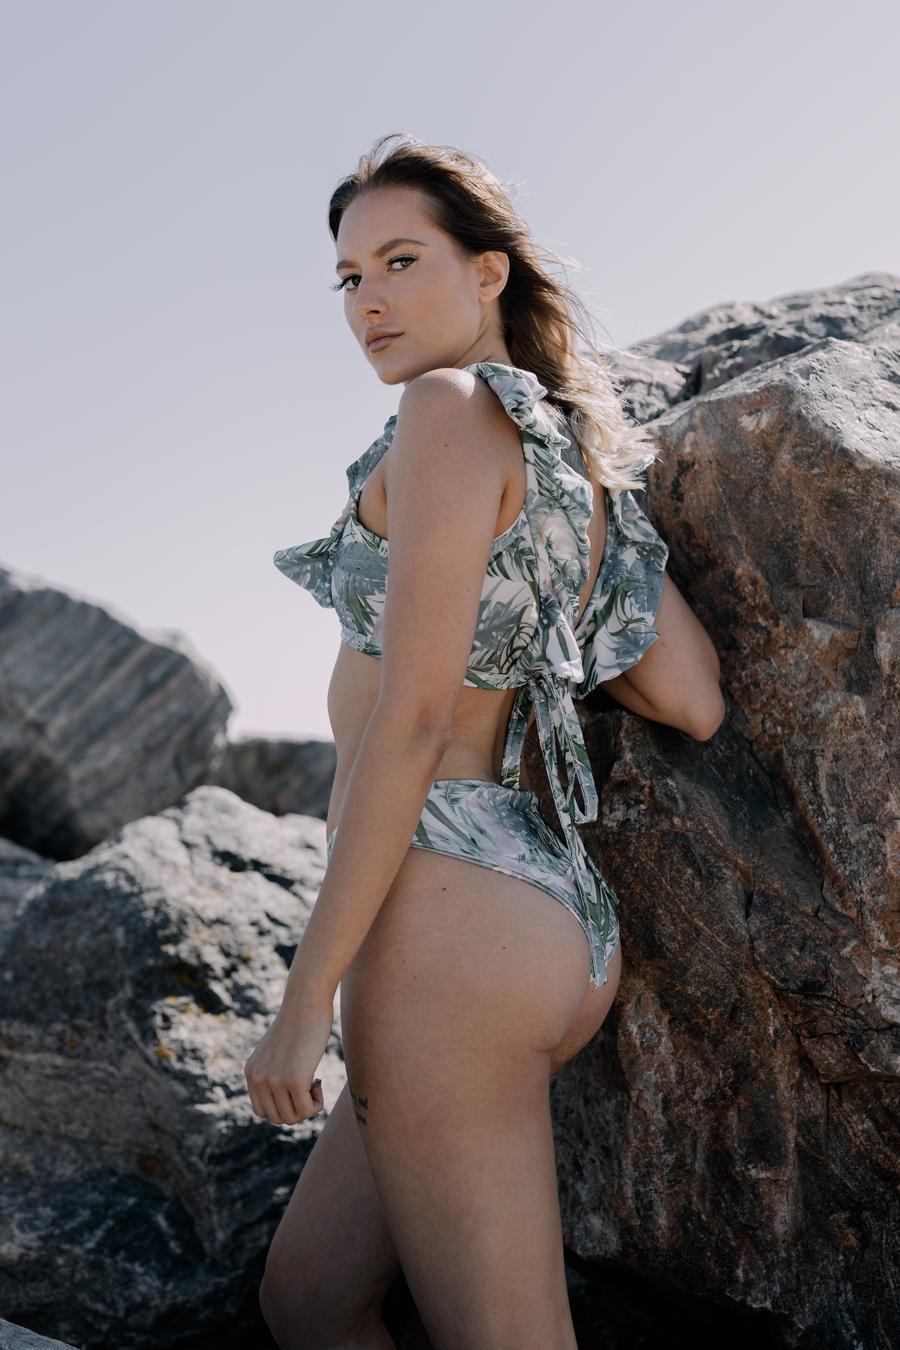 Its beach weather  / Photography by Scott Davis, Model Abbeygracelargent / Uploaded 2nd June 2021 @ 01:15 PM